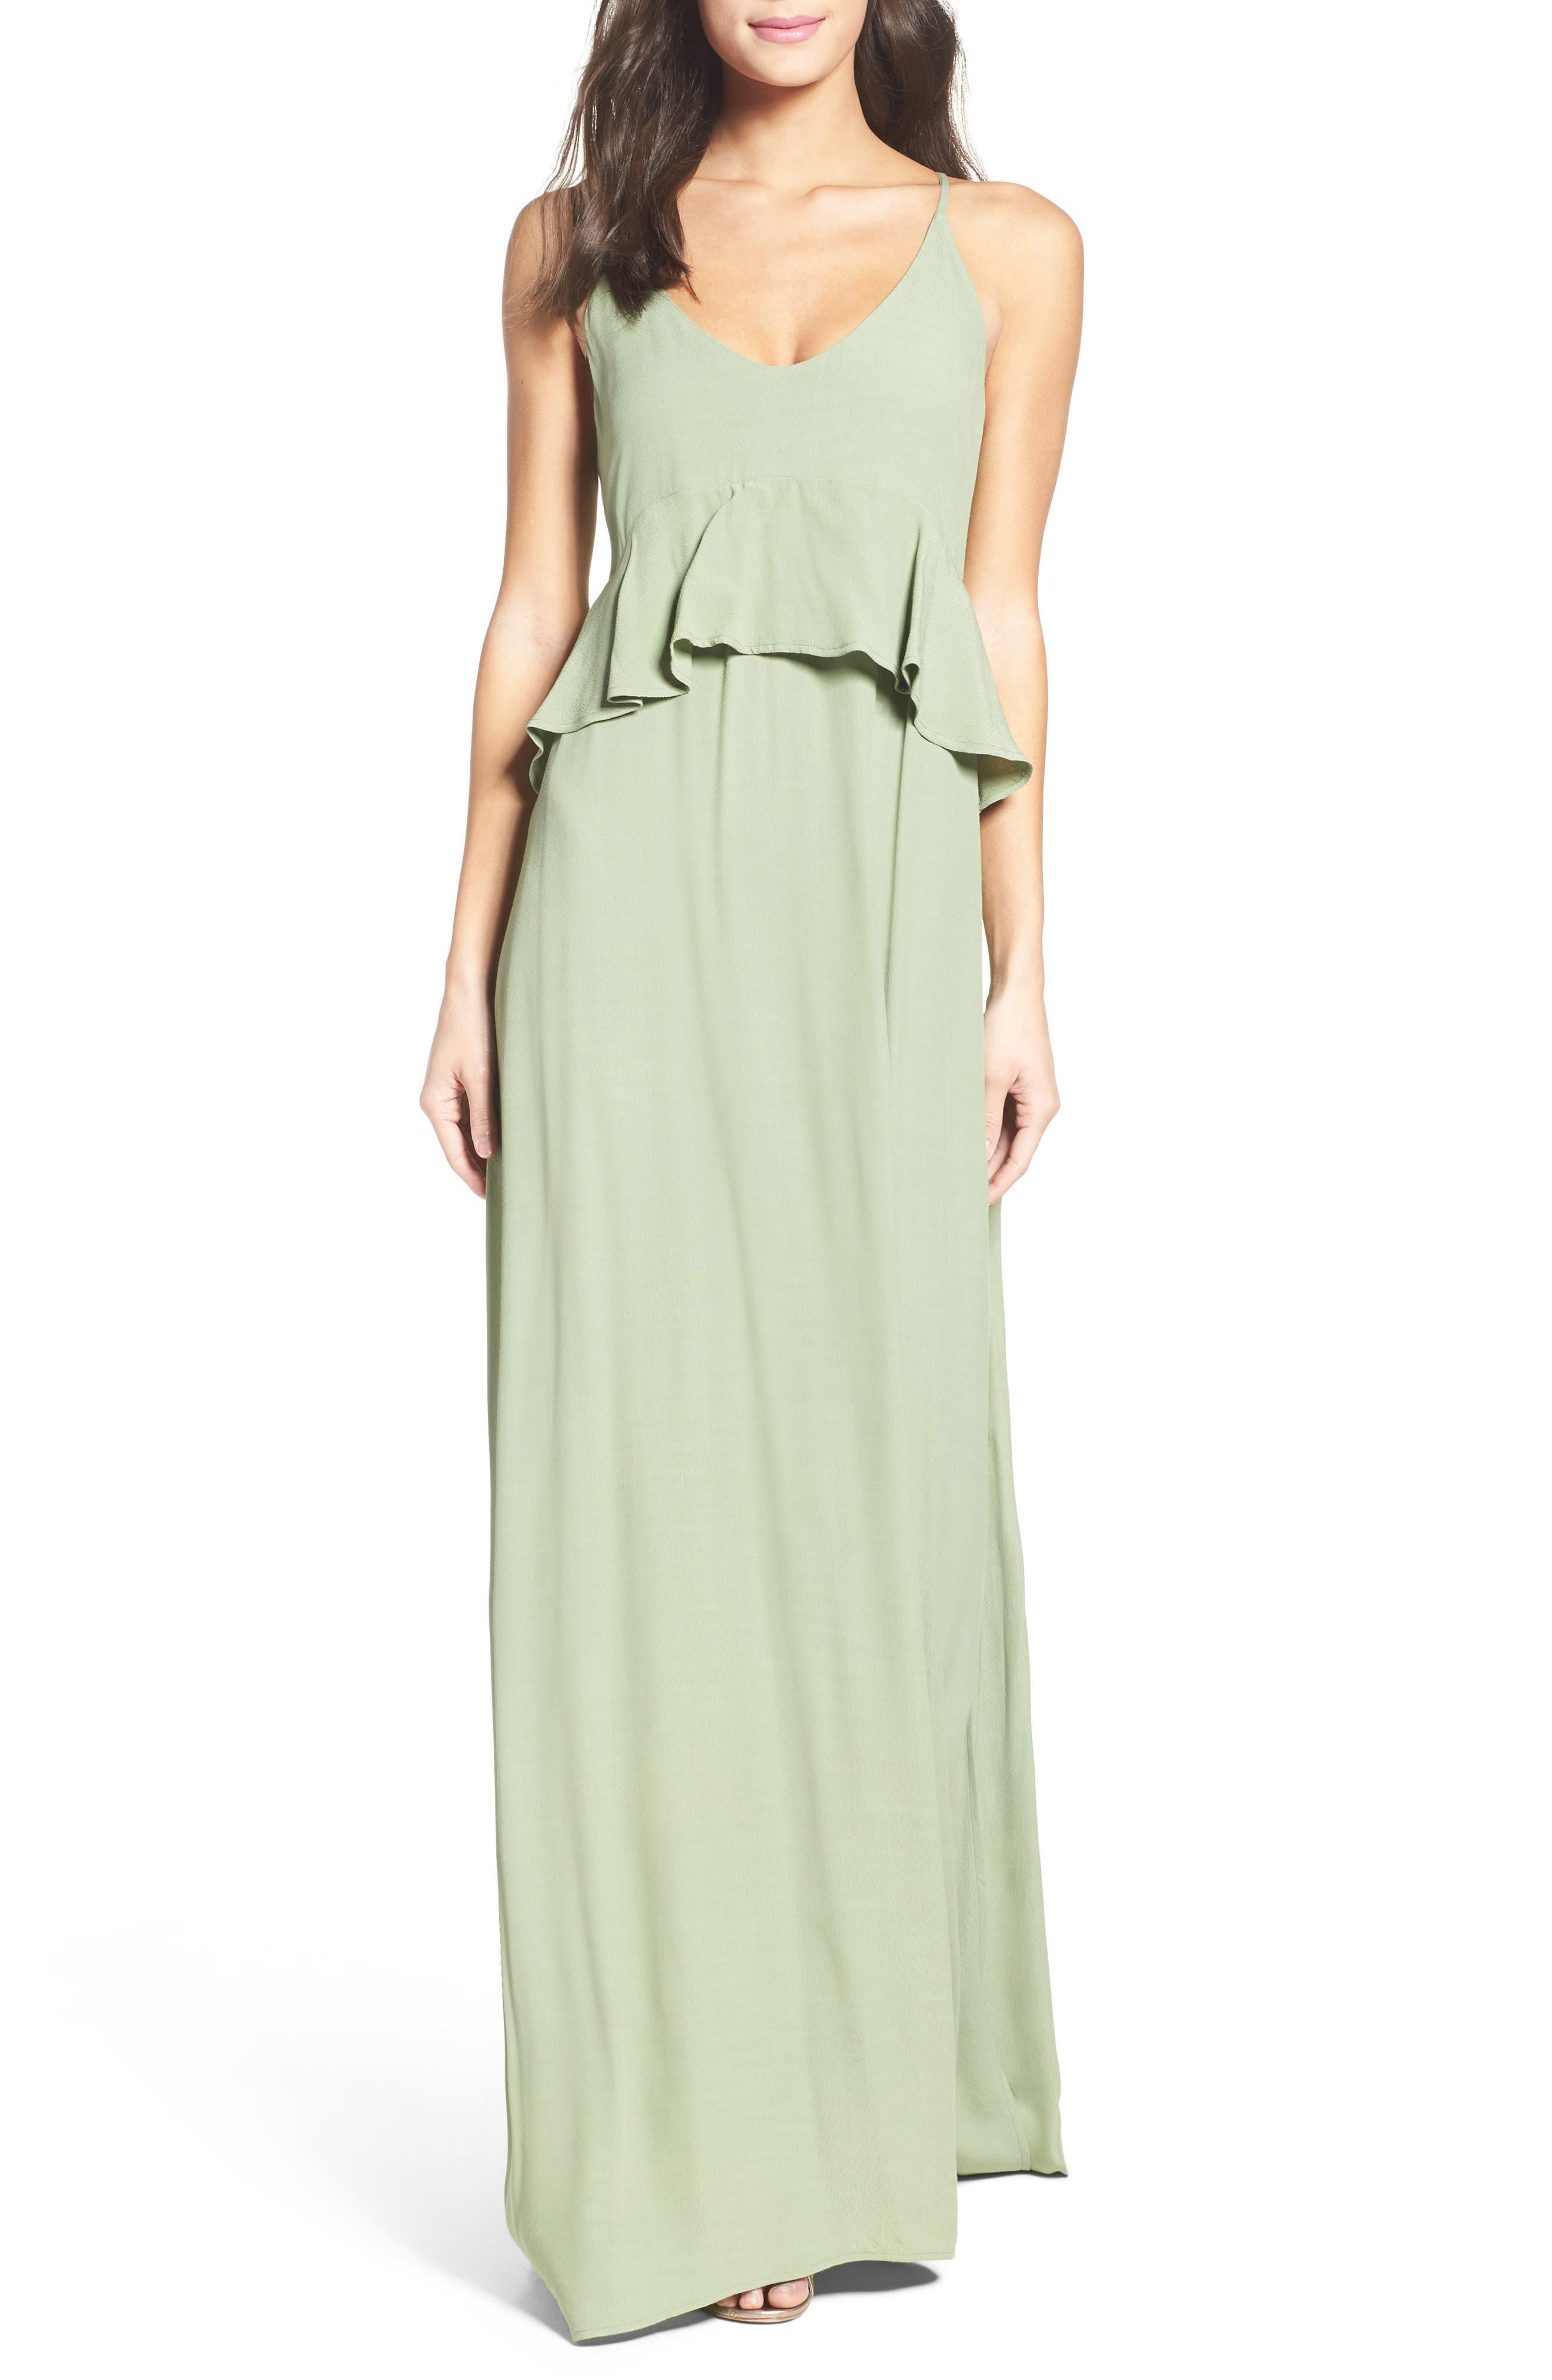 Roe + May Jolie Crepe Peplum Dress,                             Main thumbnail 1, color,